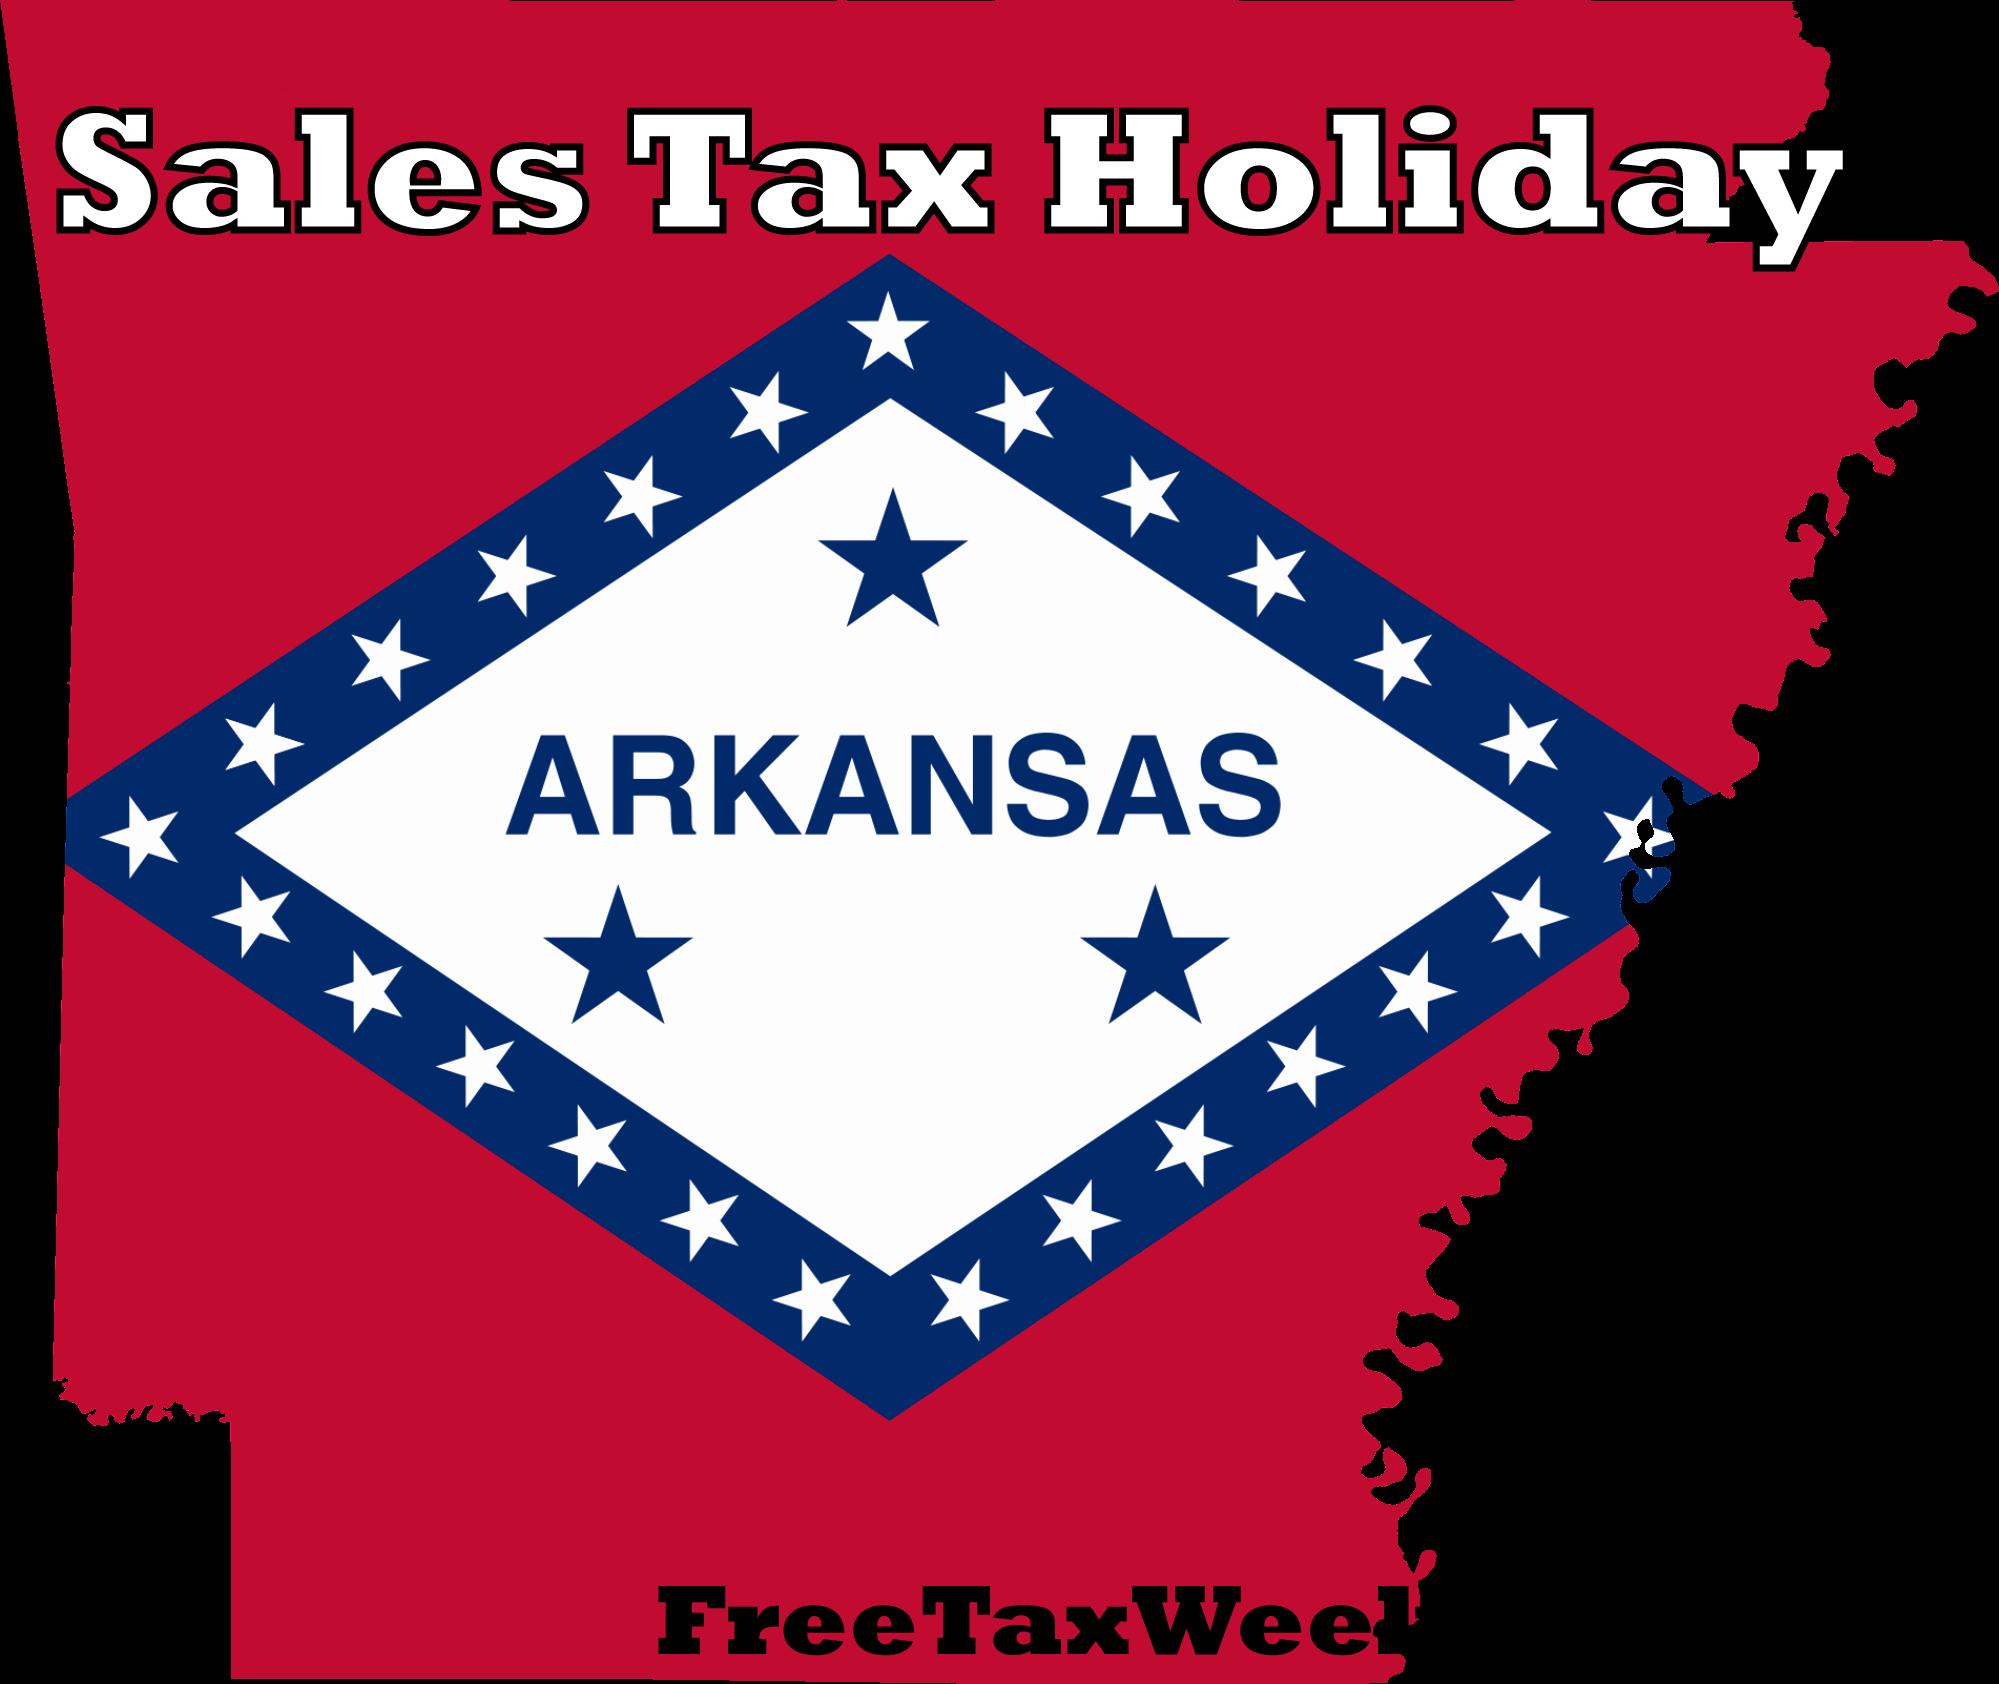 Arkansas Sales Tax Holiday 2019